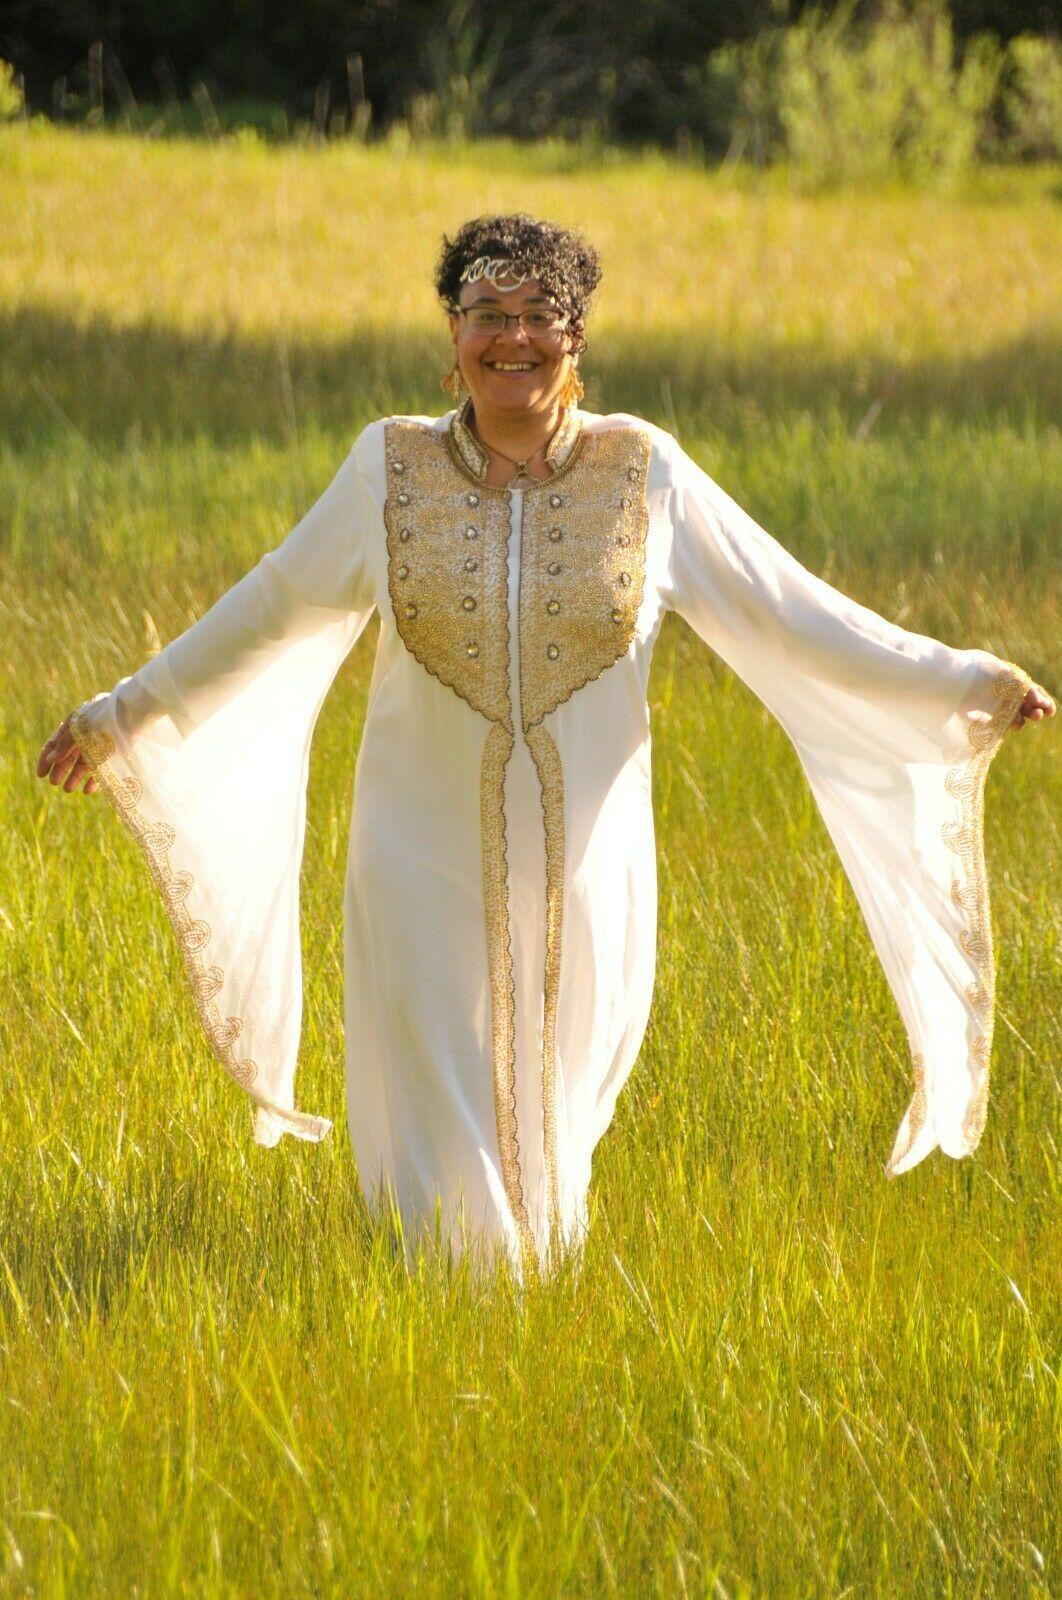 Handbeaded High Holy Day Kaftan Long Dress Wing Sleve X Large White Gold Long Dress Dresses Special Dresses